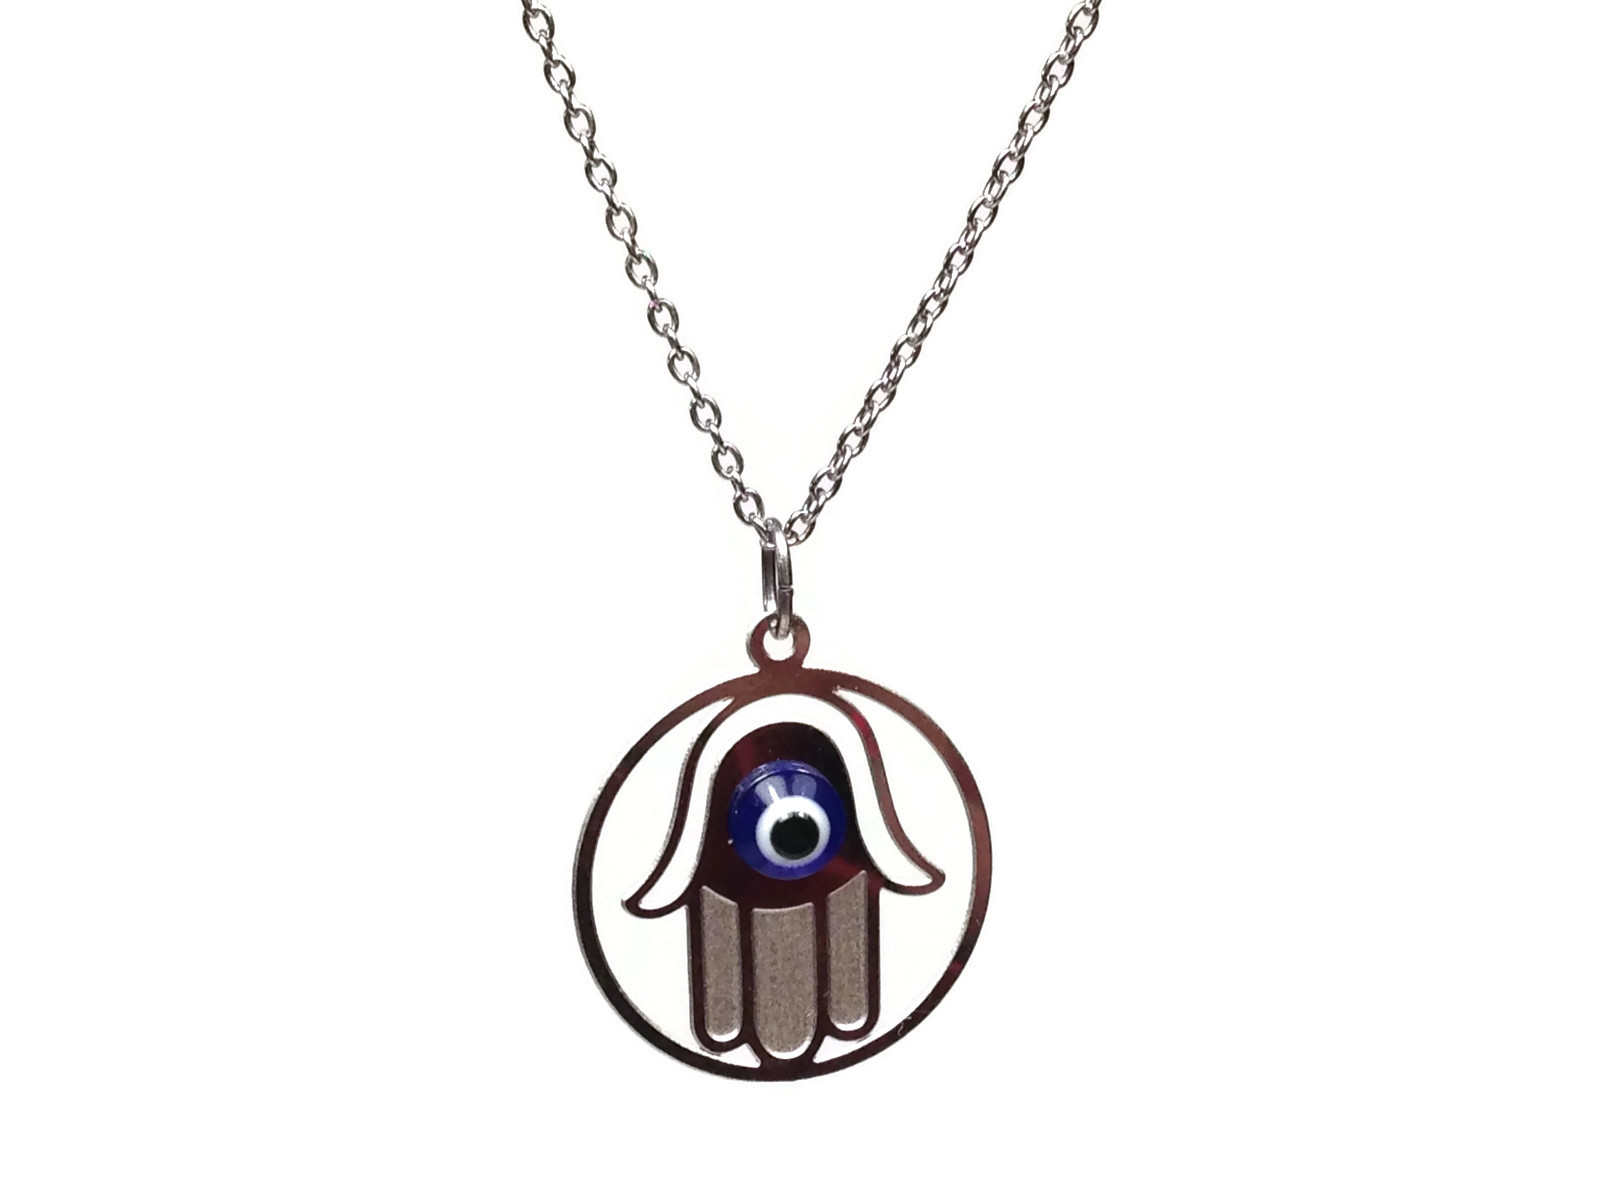 hamsa hand pendant in stainless steel